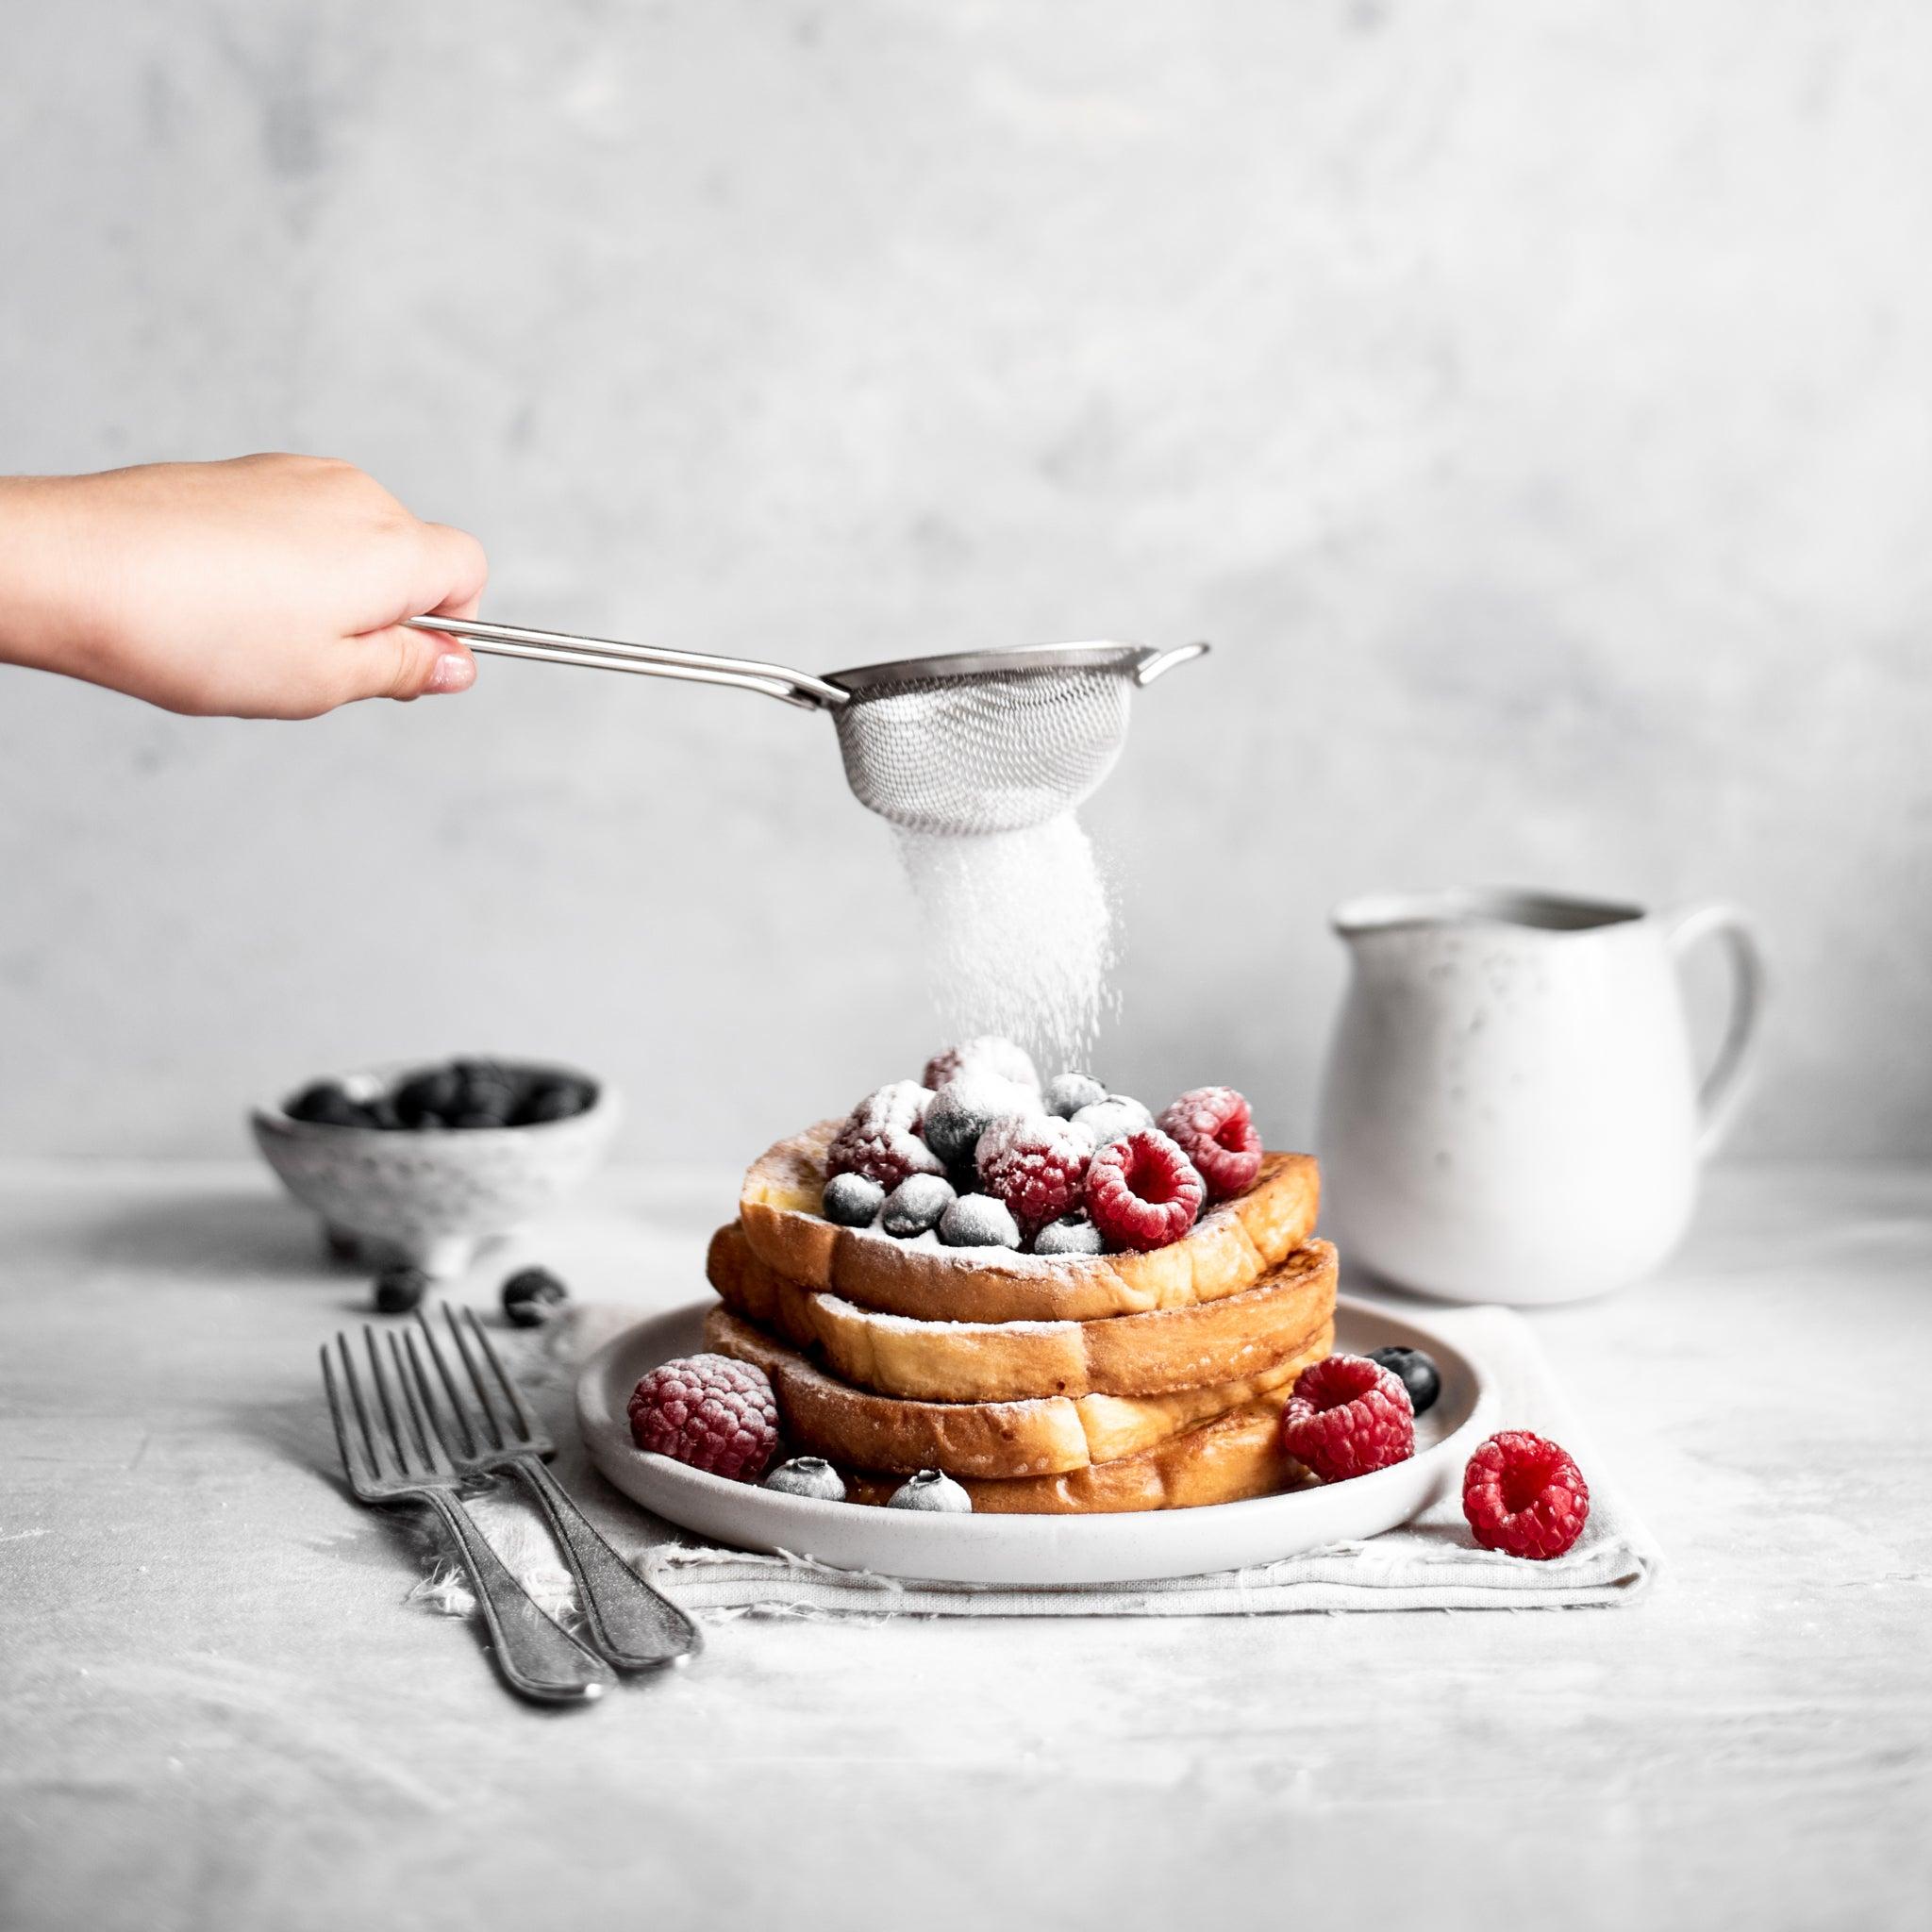 Vanilla-French-Toast-SQUARE-5.jpg